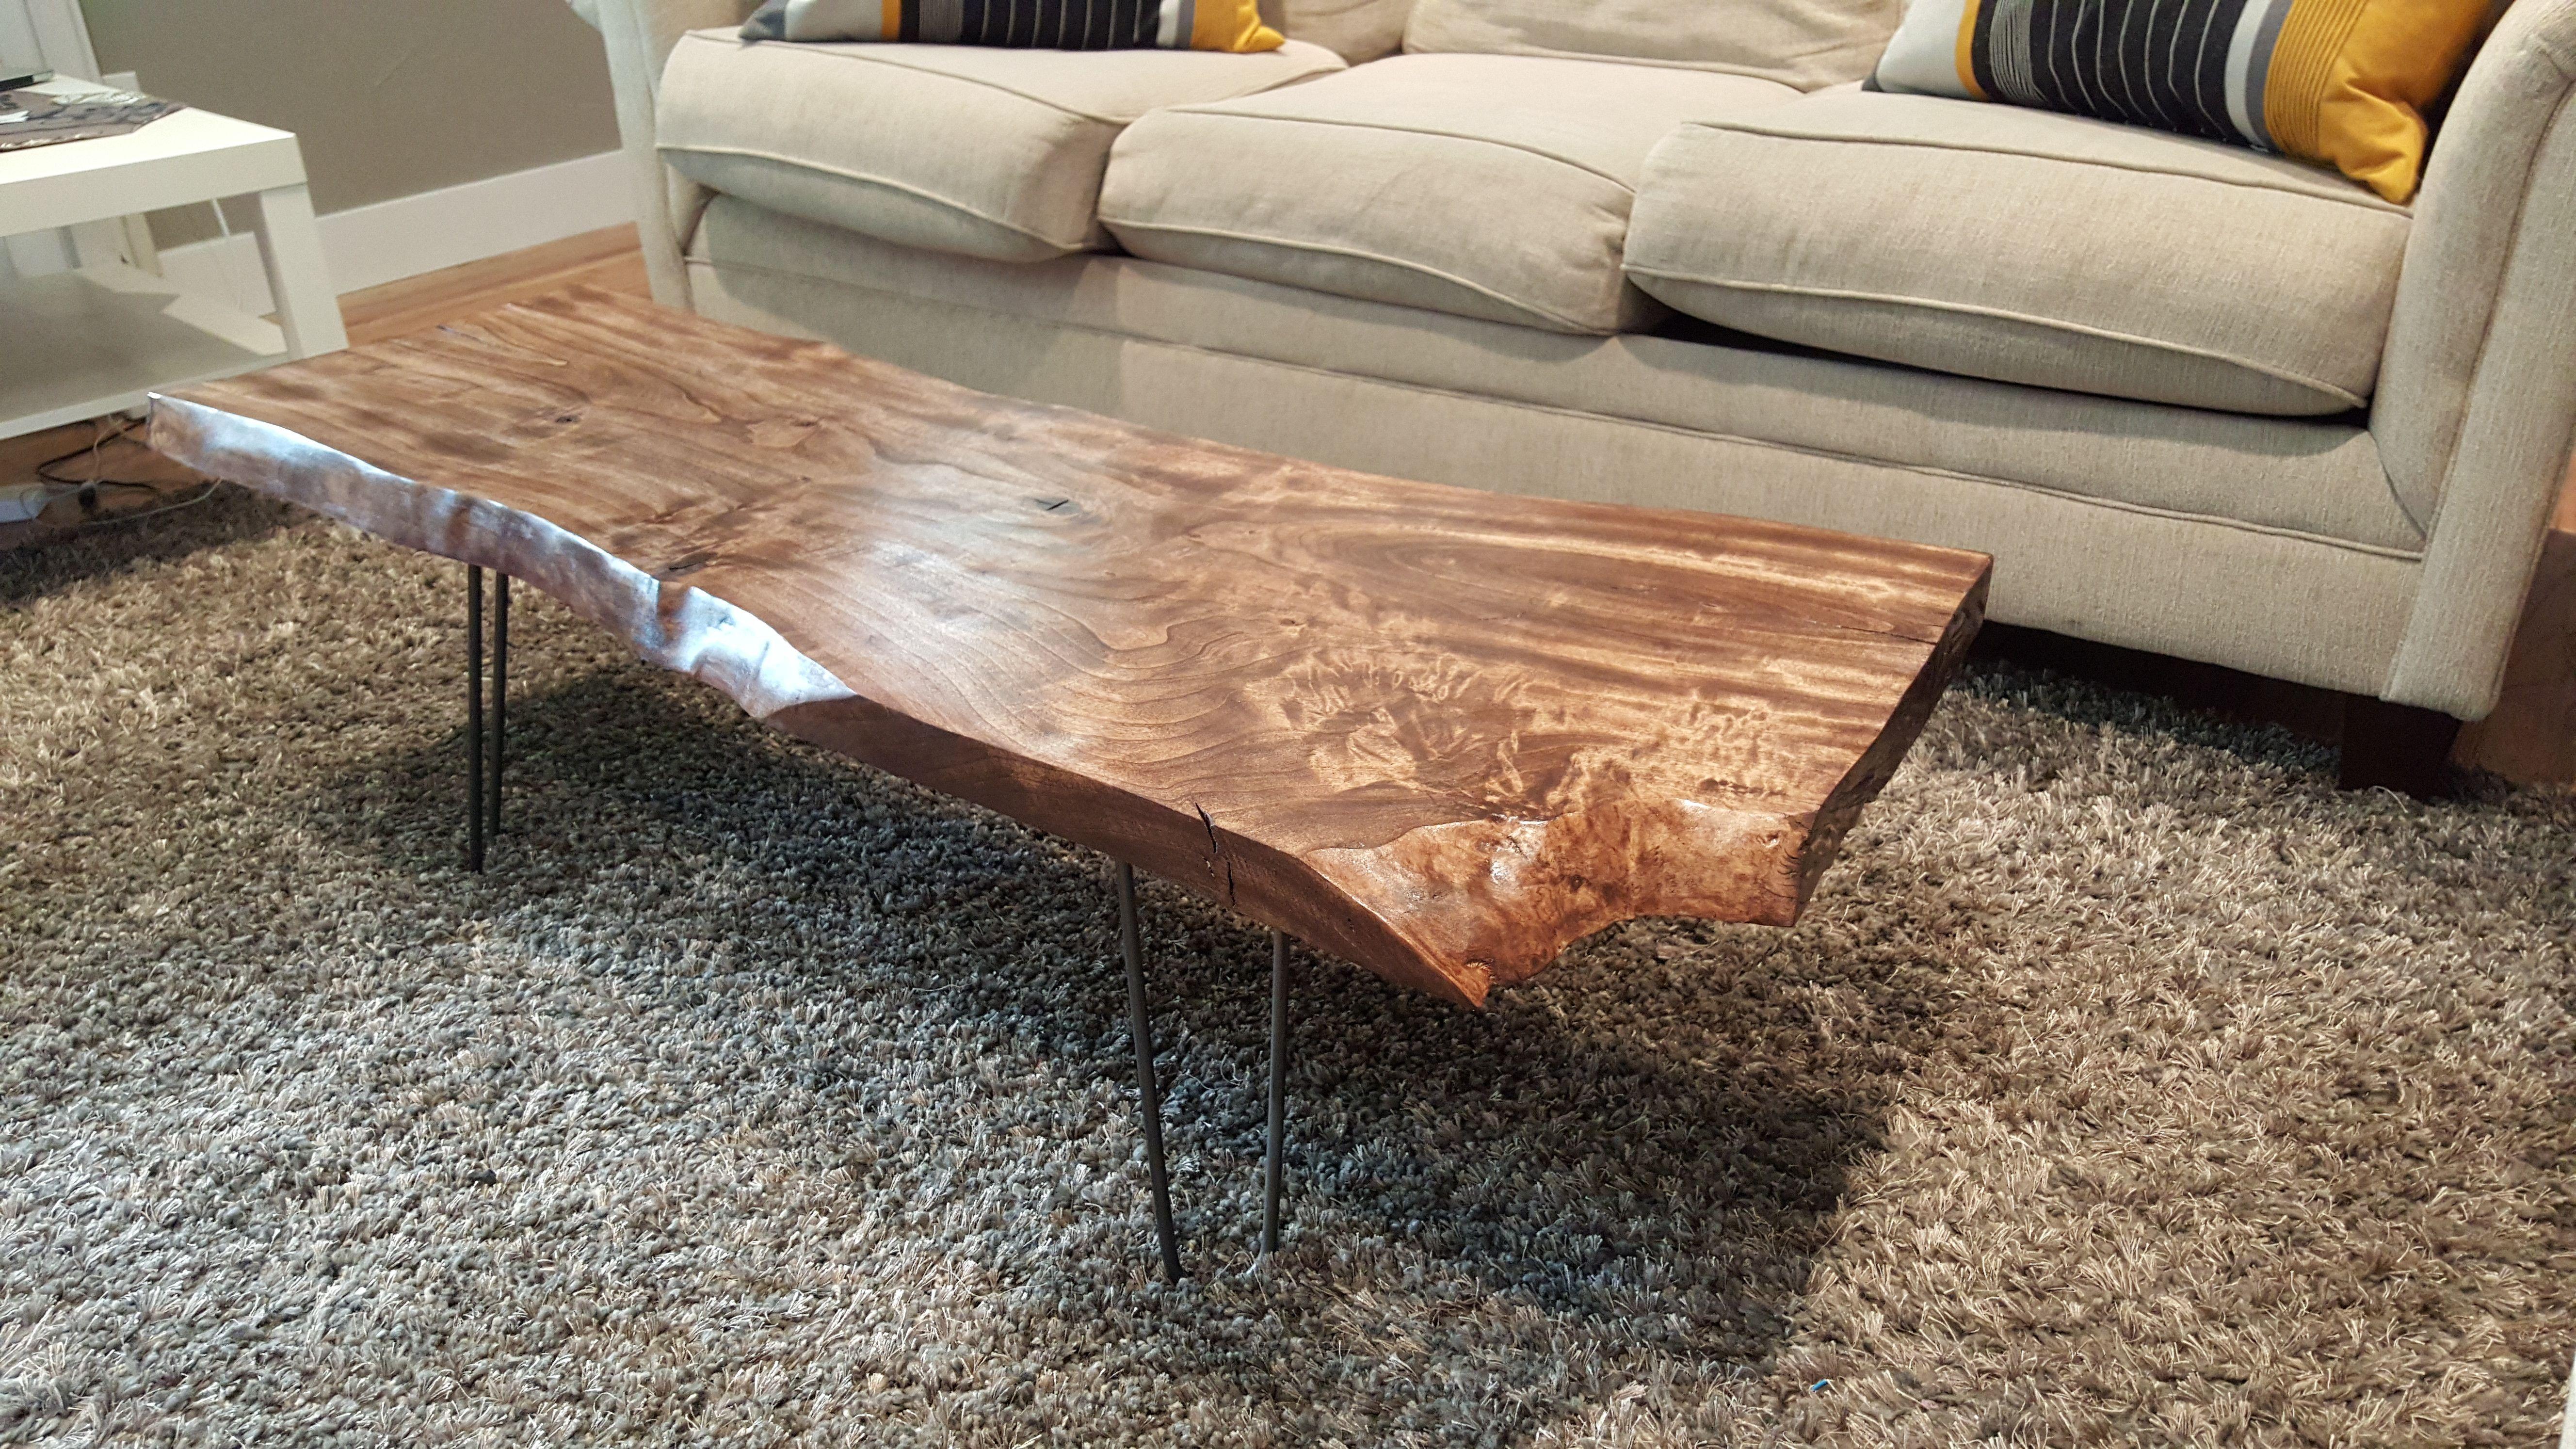 Diy Live Edge Wood Coffee Table Diy And Haus Decorations Rustic regarding dimensions 5312 X 2988